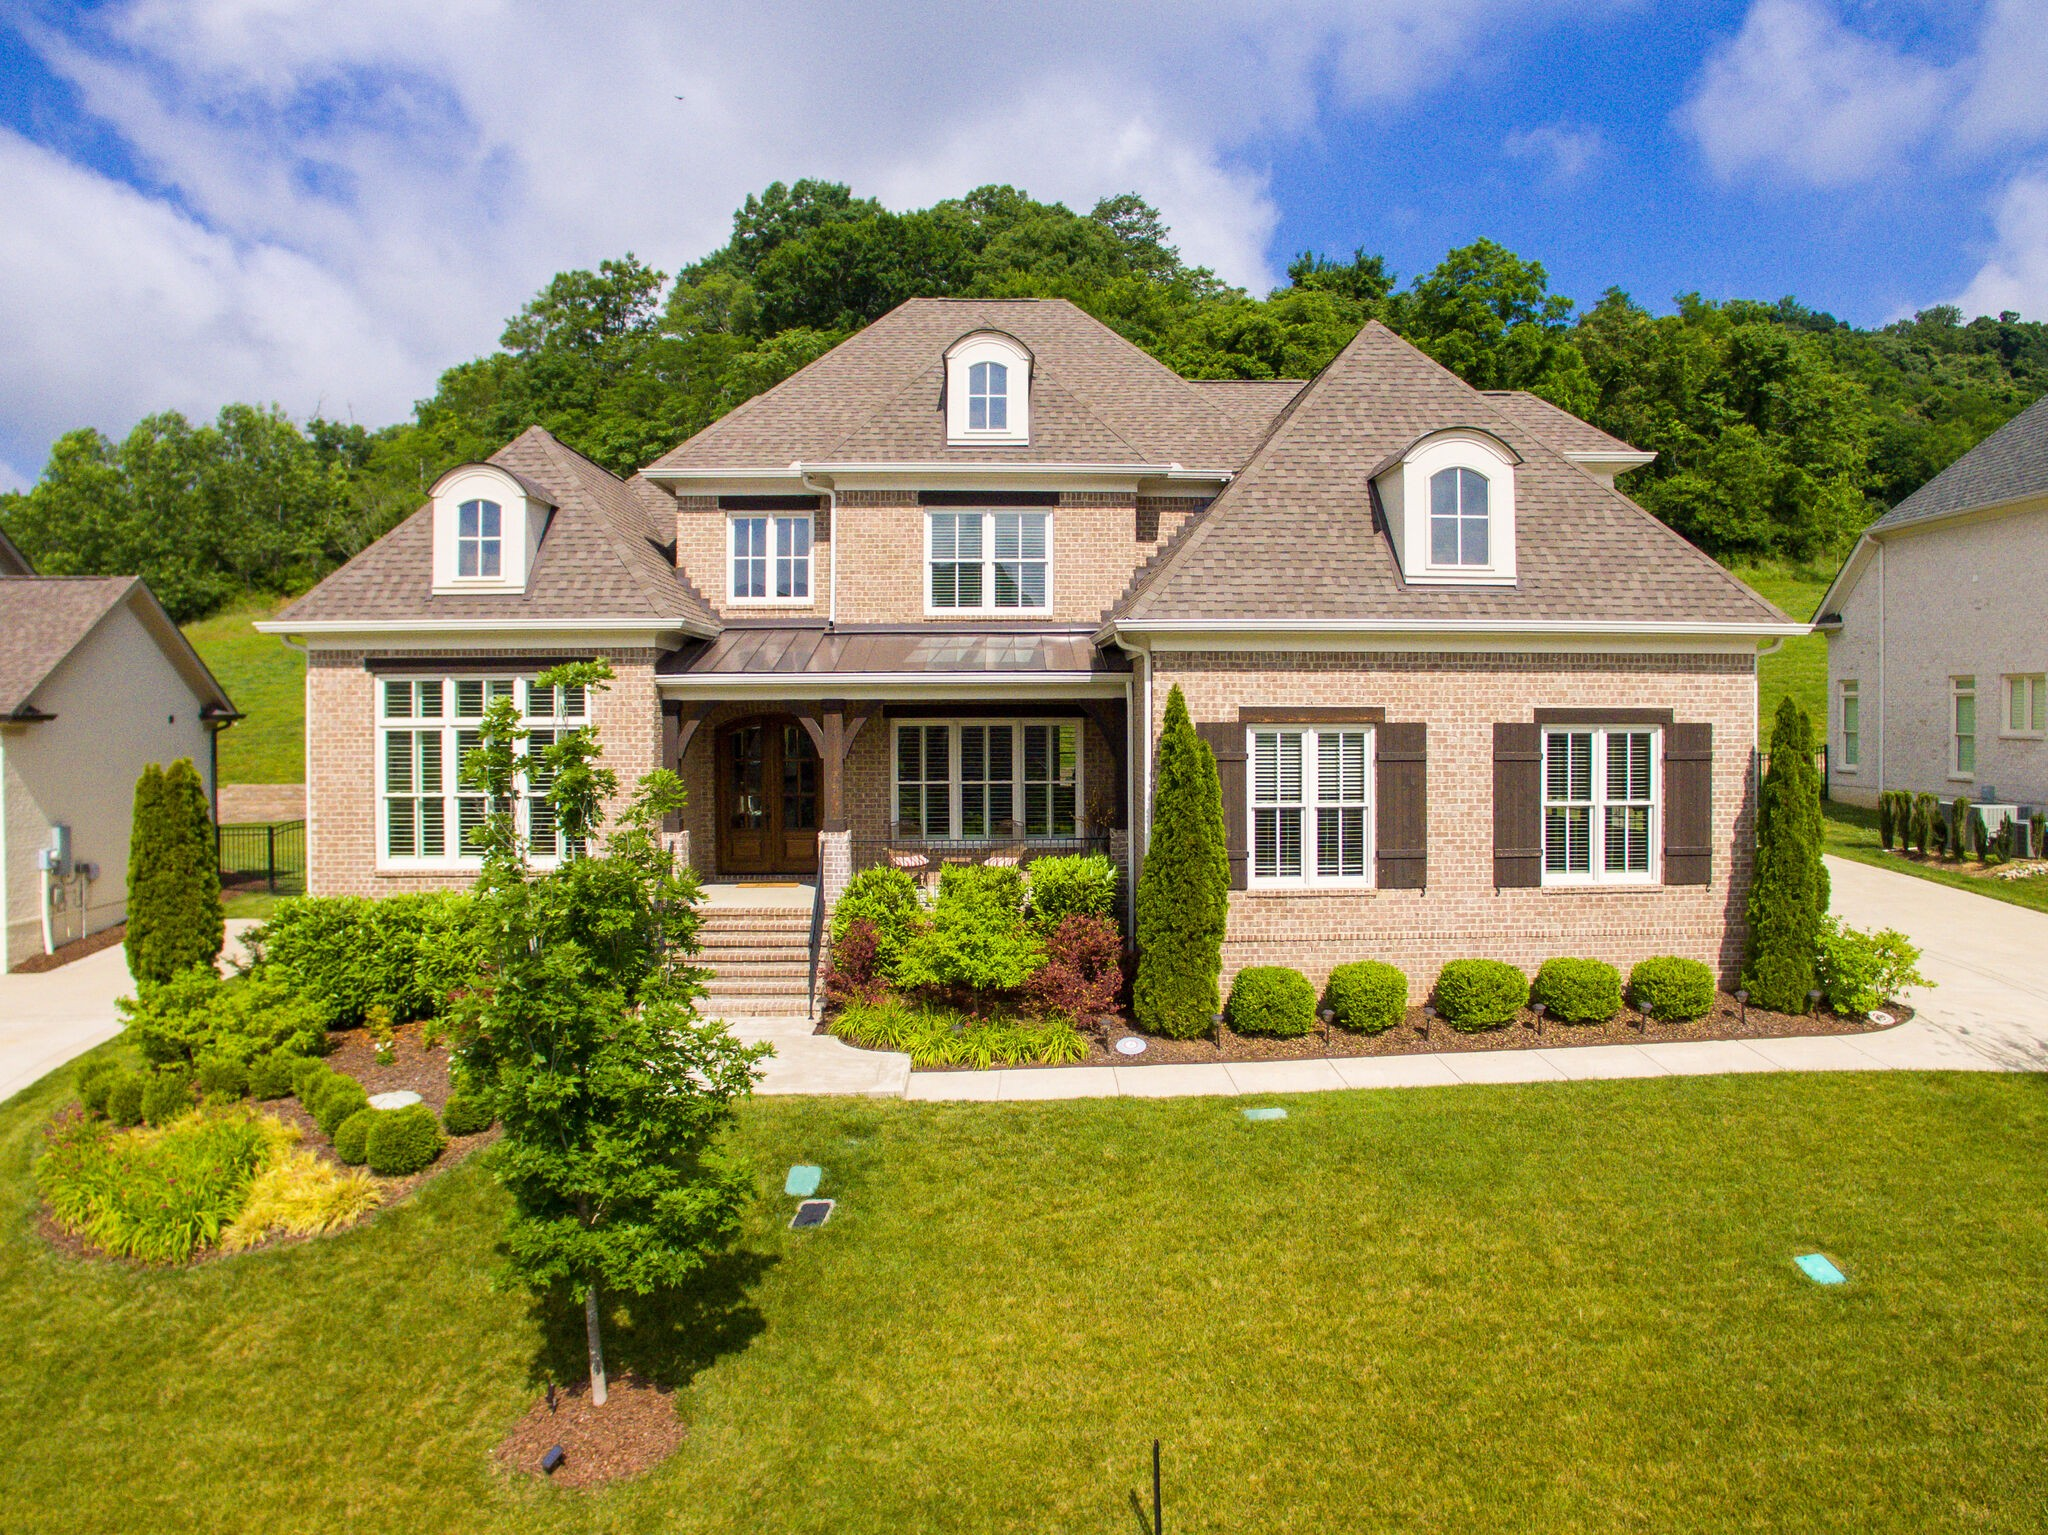 2171 Hartland Rd Property Photo - Franklin, TN real estate listing